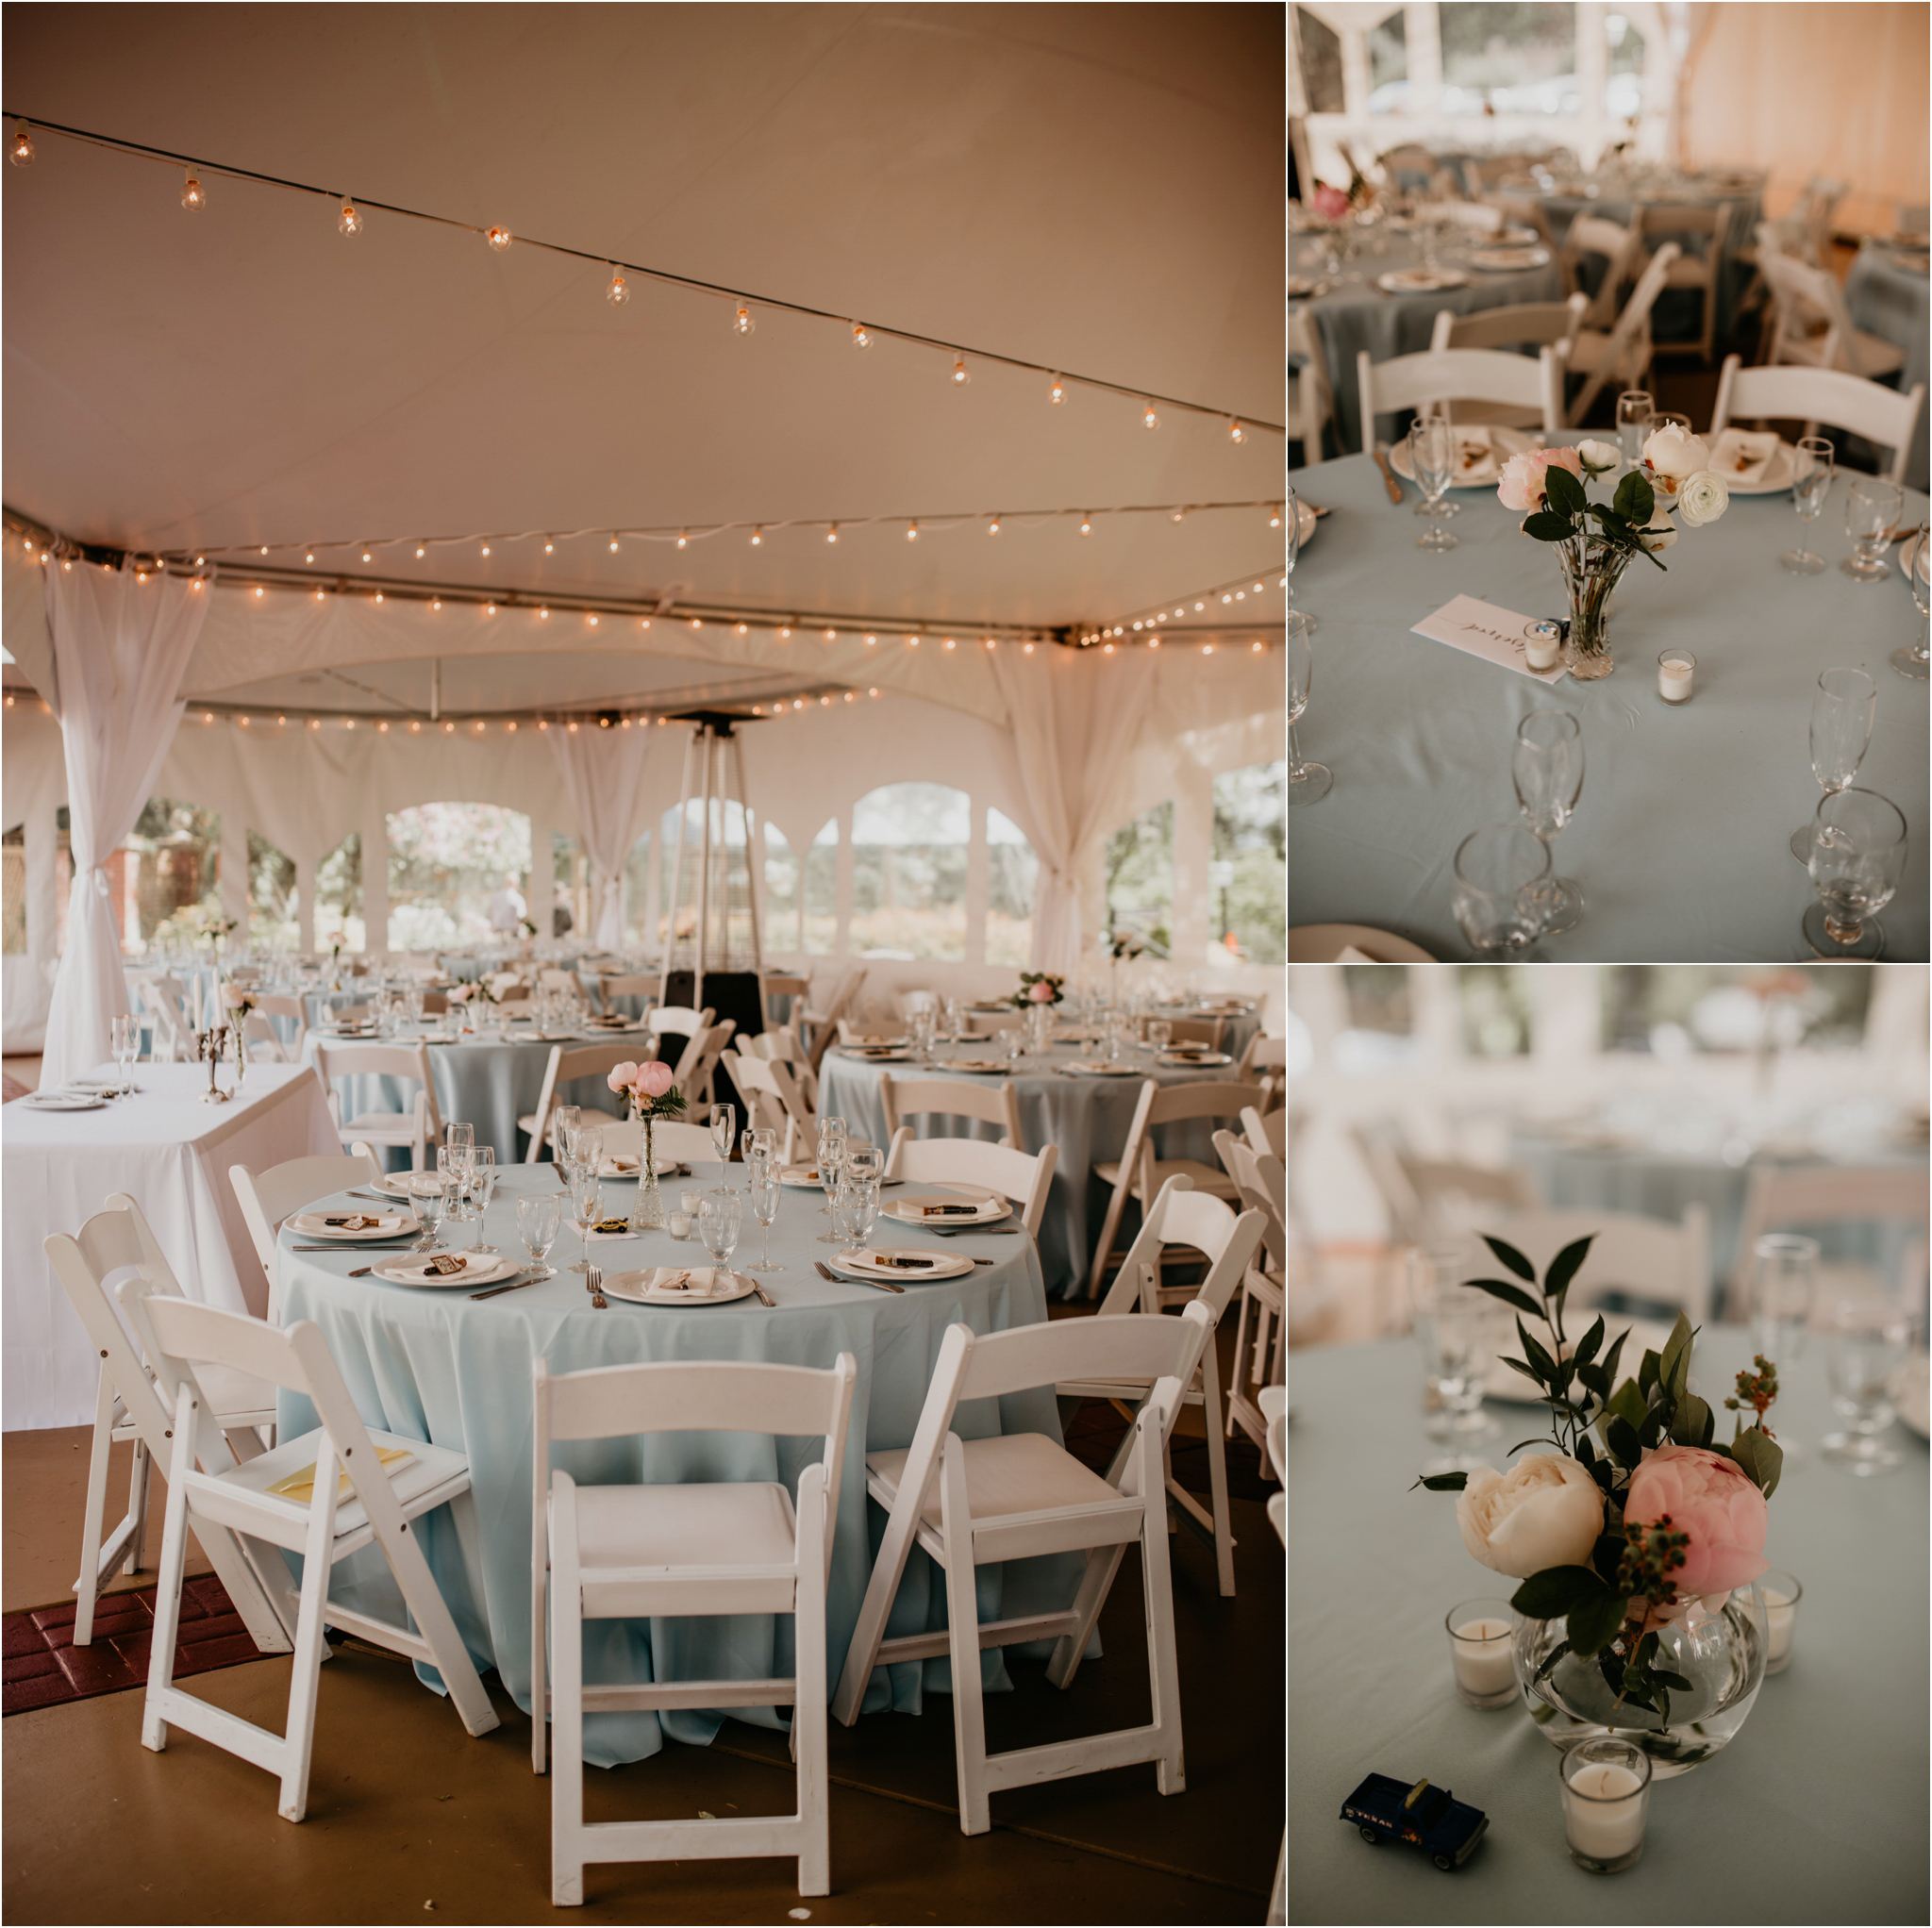 chance-and-ondrea-lairmont-manor-wedding-seattle-photographer-068.jpg